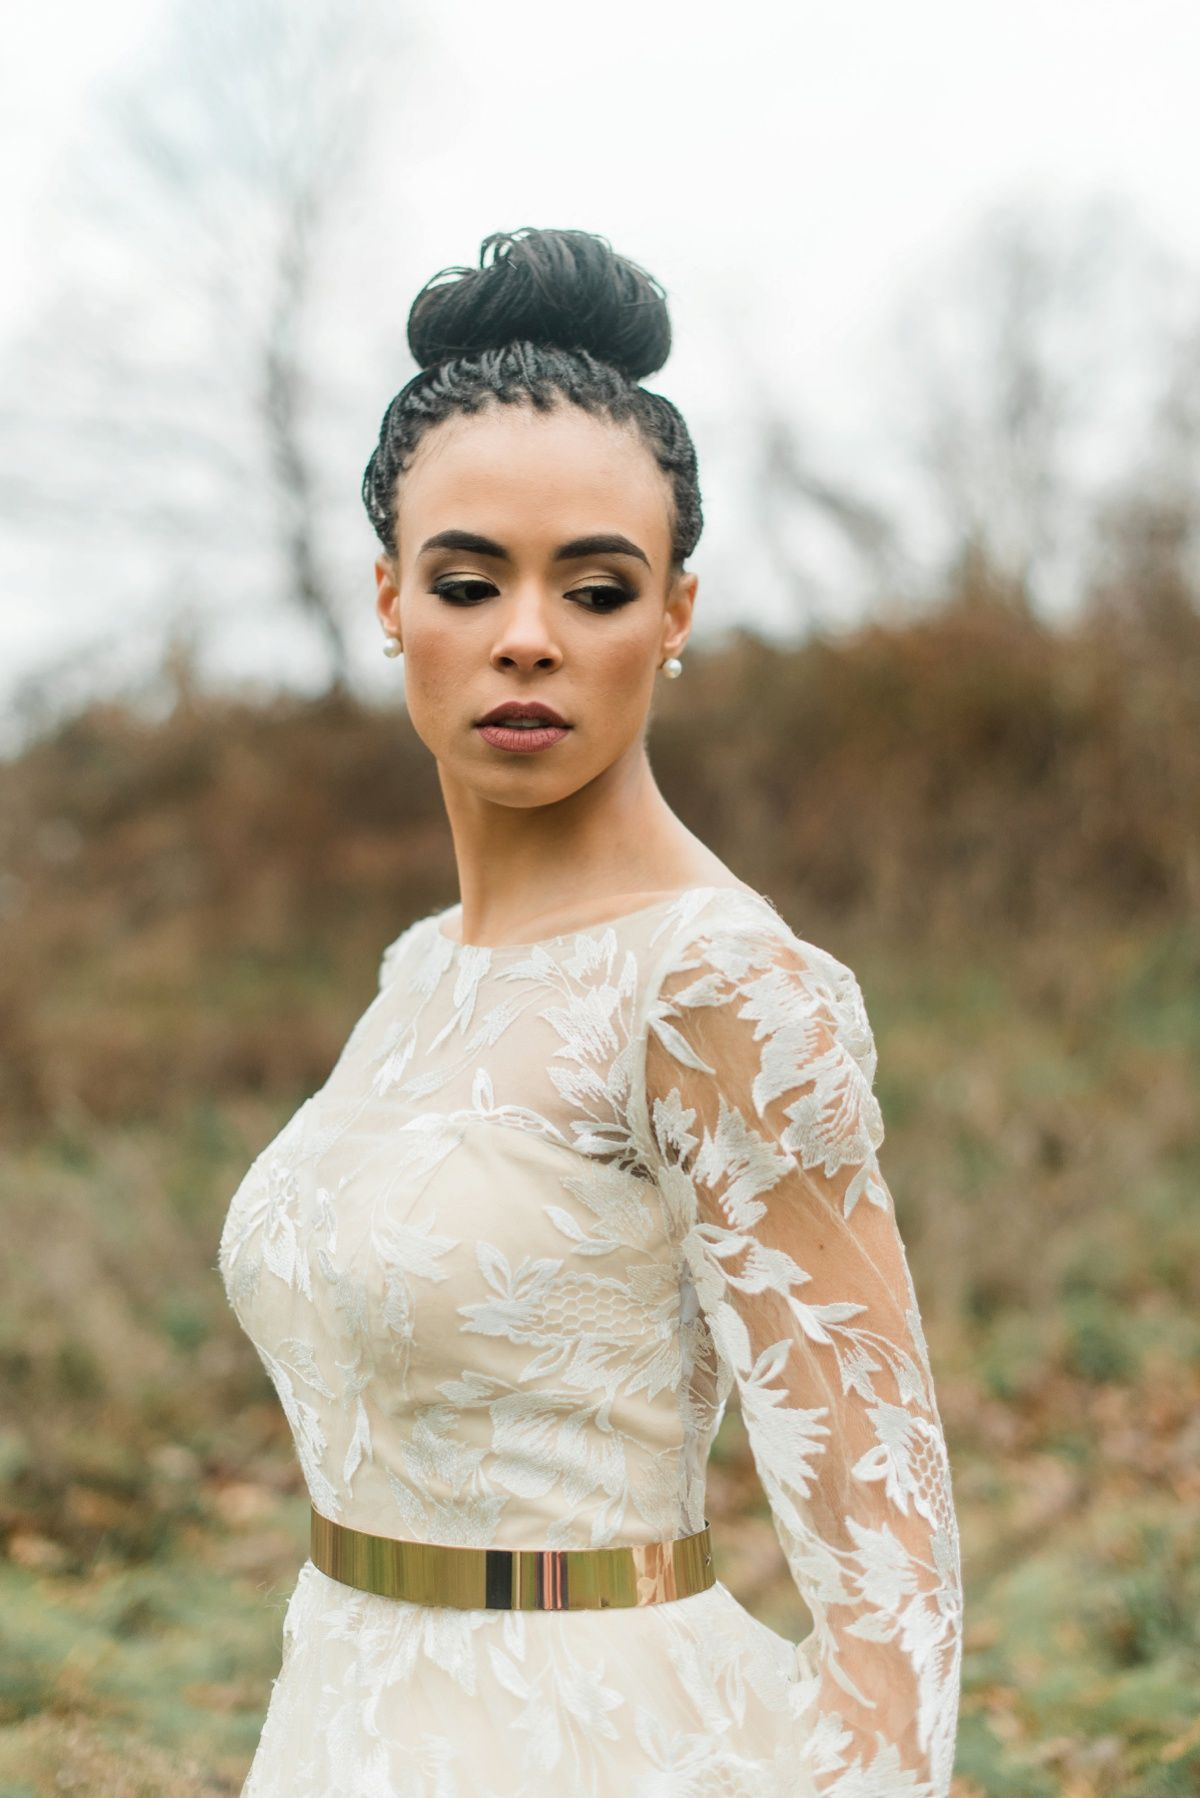 Inspiration Pittsburgh Wedding Ideas From Burgh Brides In 2020 Beautiful Wedding Makeup Bride Bride Look